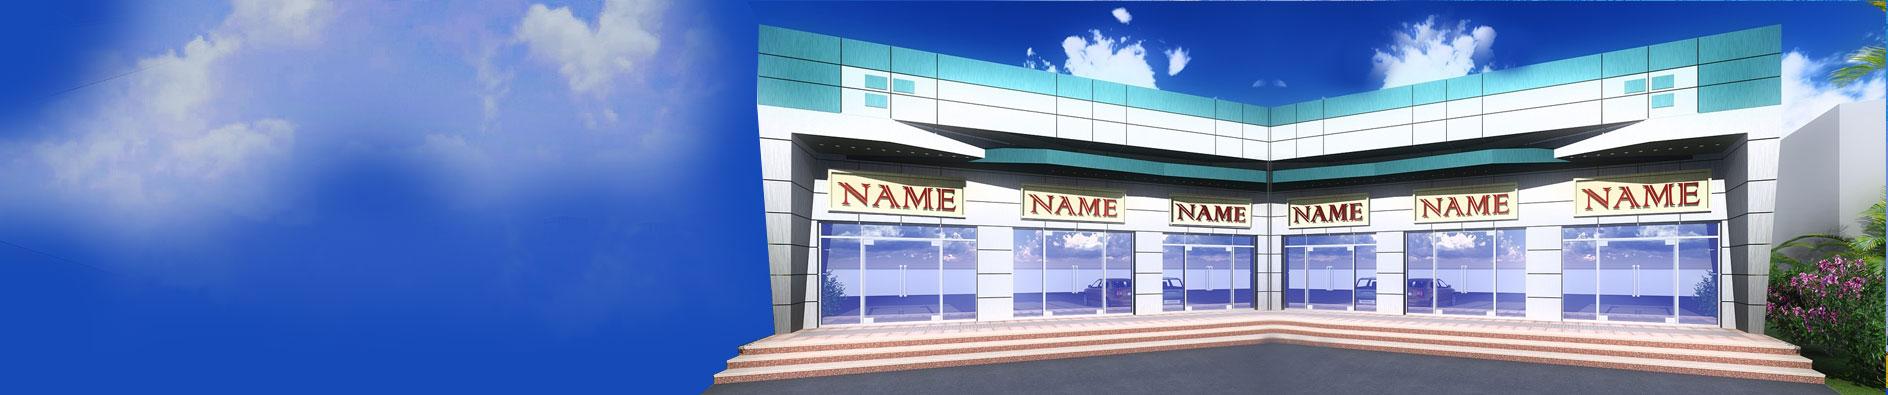 banner-retail-strip-centre-mortgage